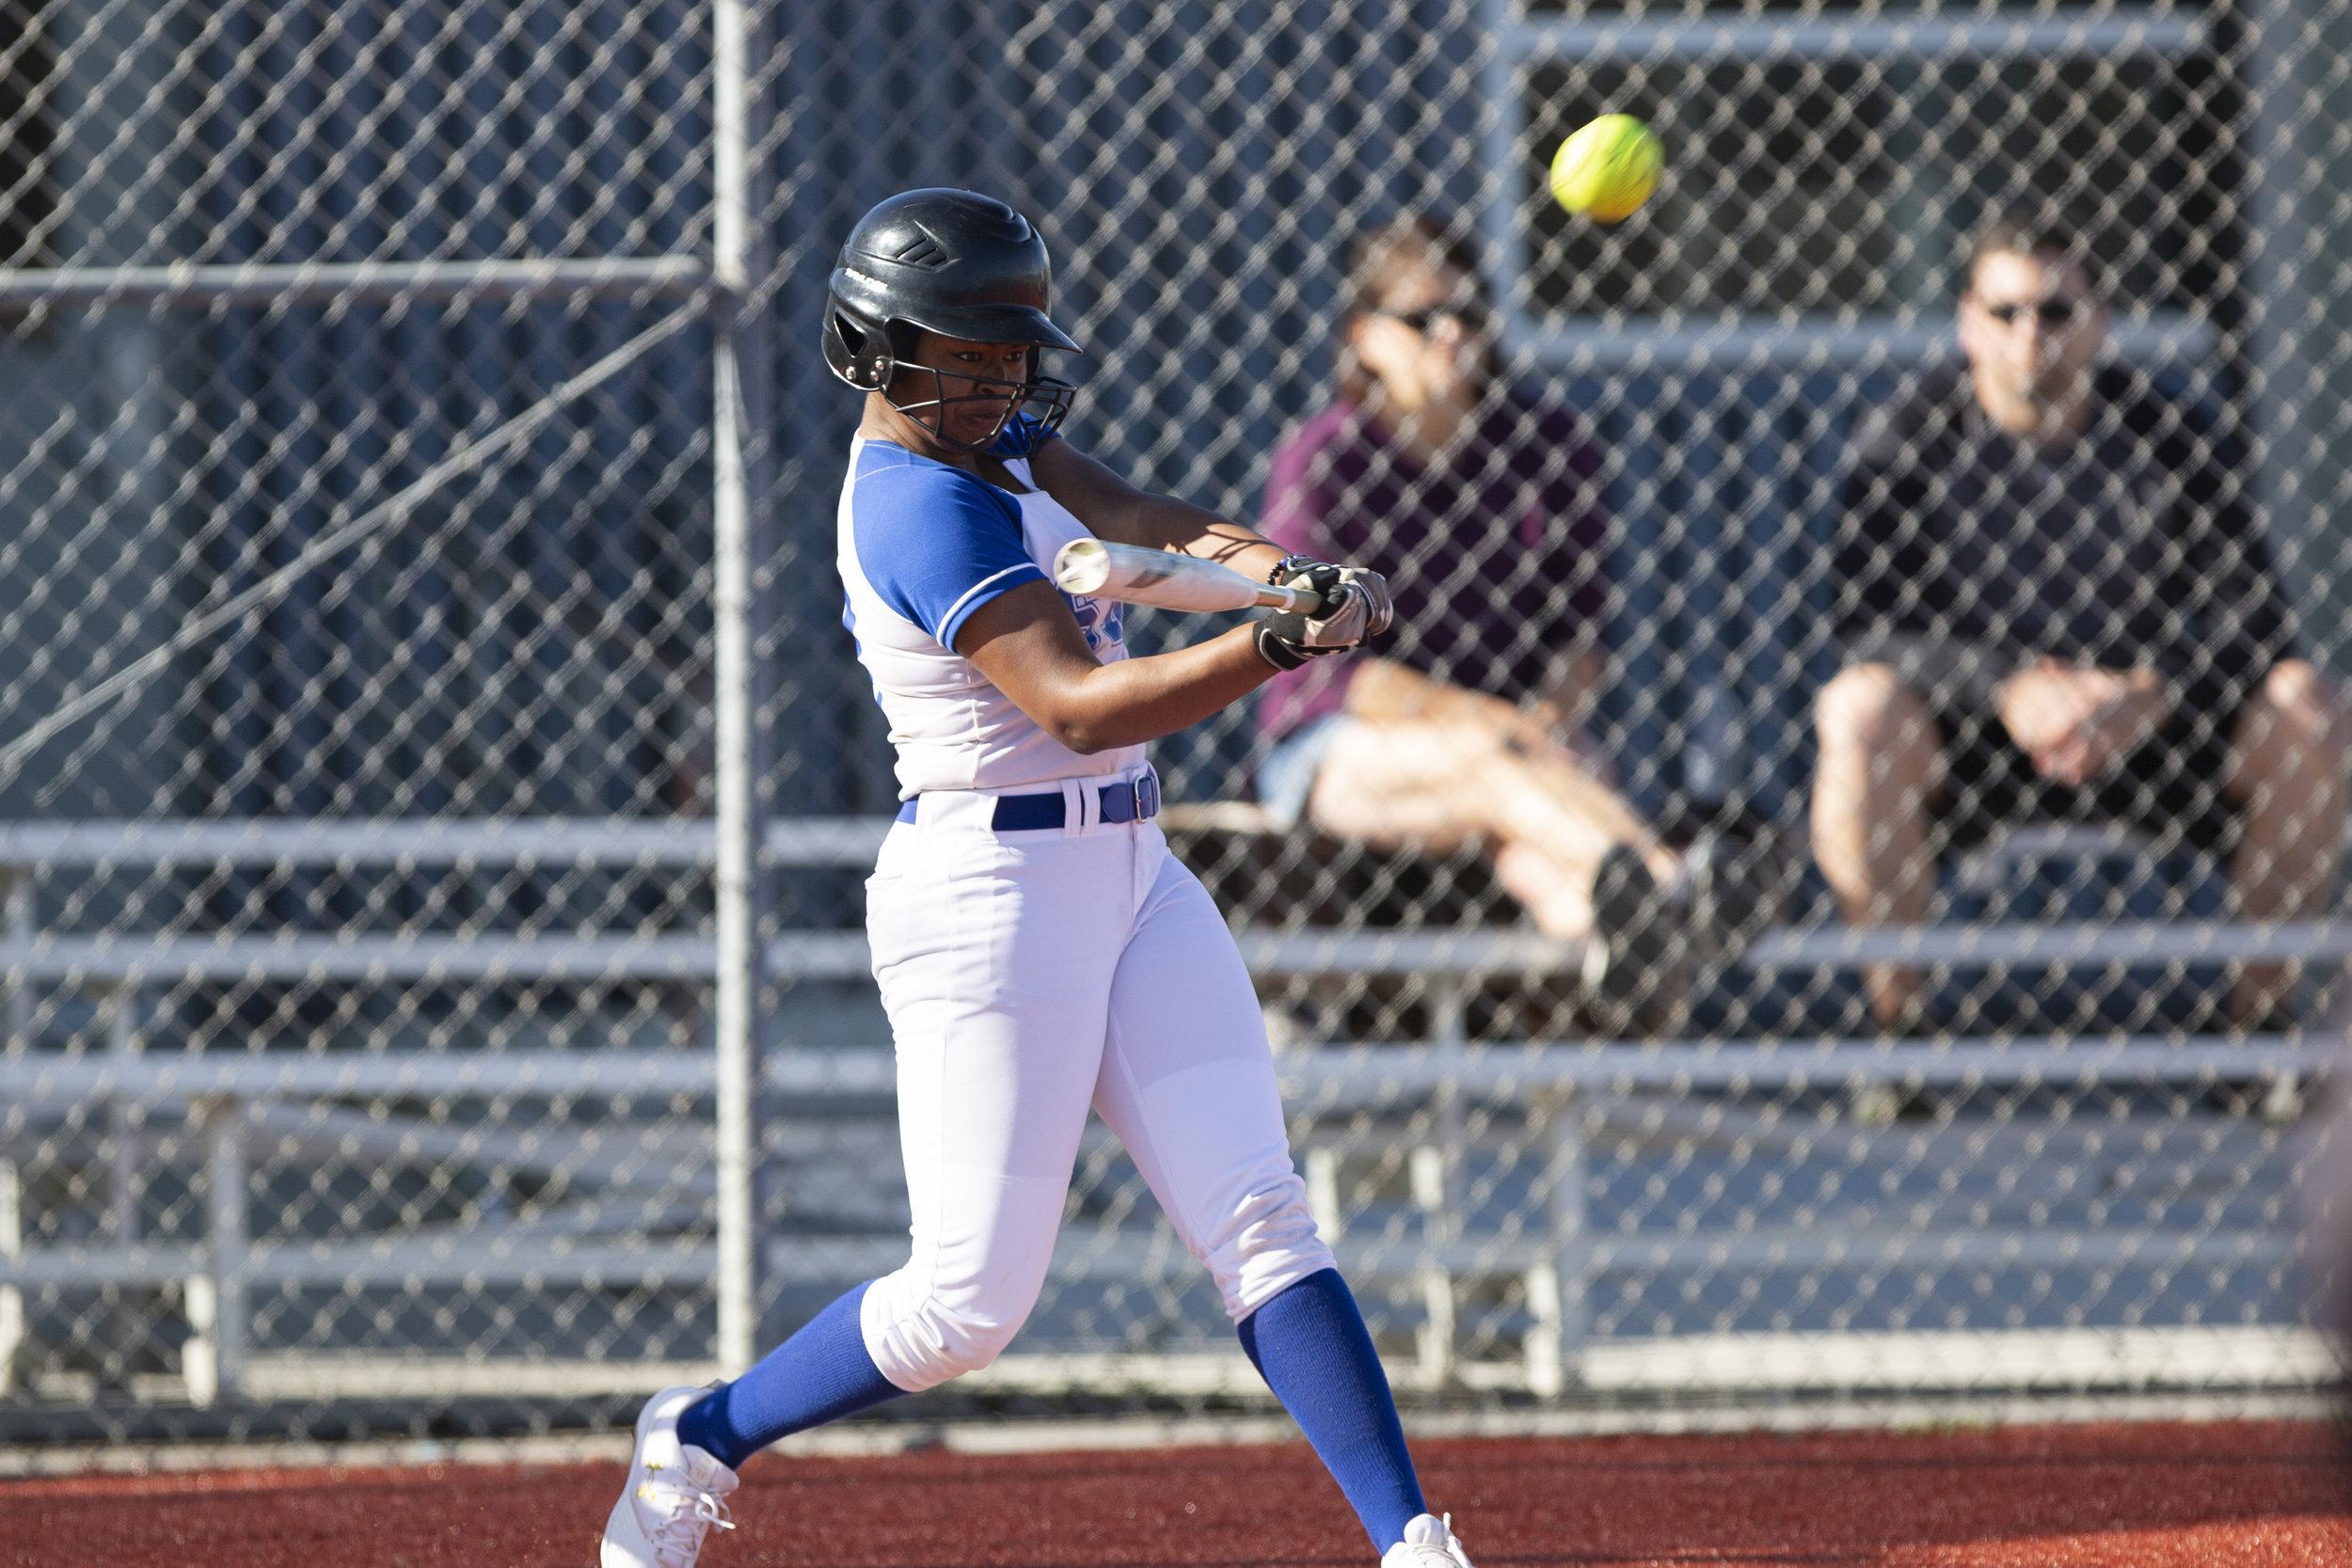 Jasmine Loftin, from Santa Monica College softball team playing at home vs Moorpark team, Thursday, March 7, 2019 in Santa Monica, Calif.